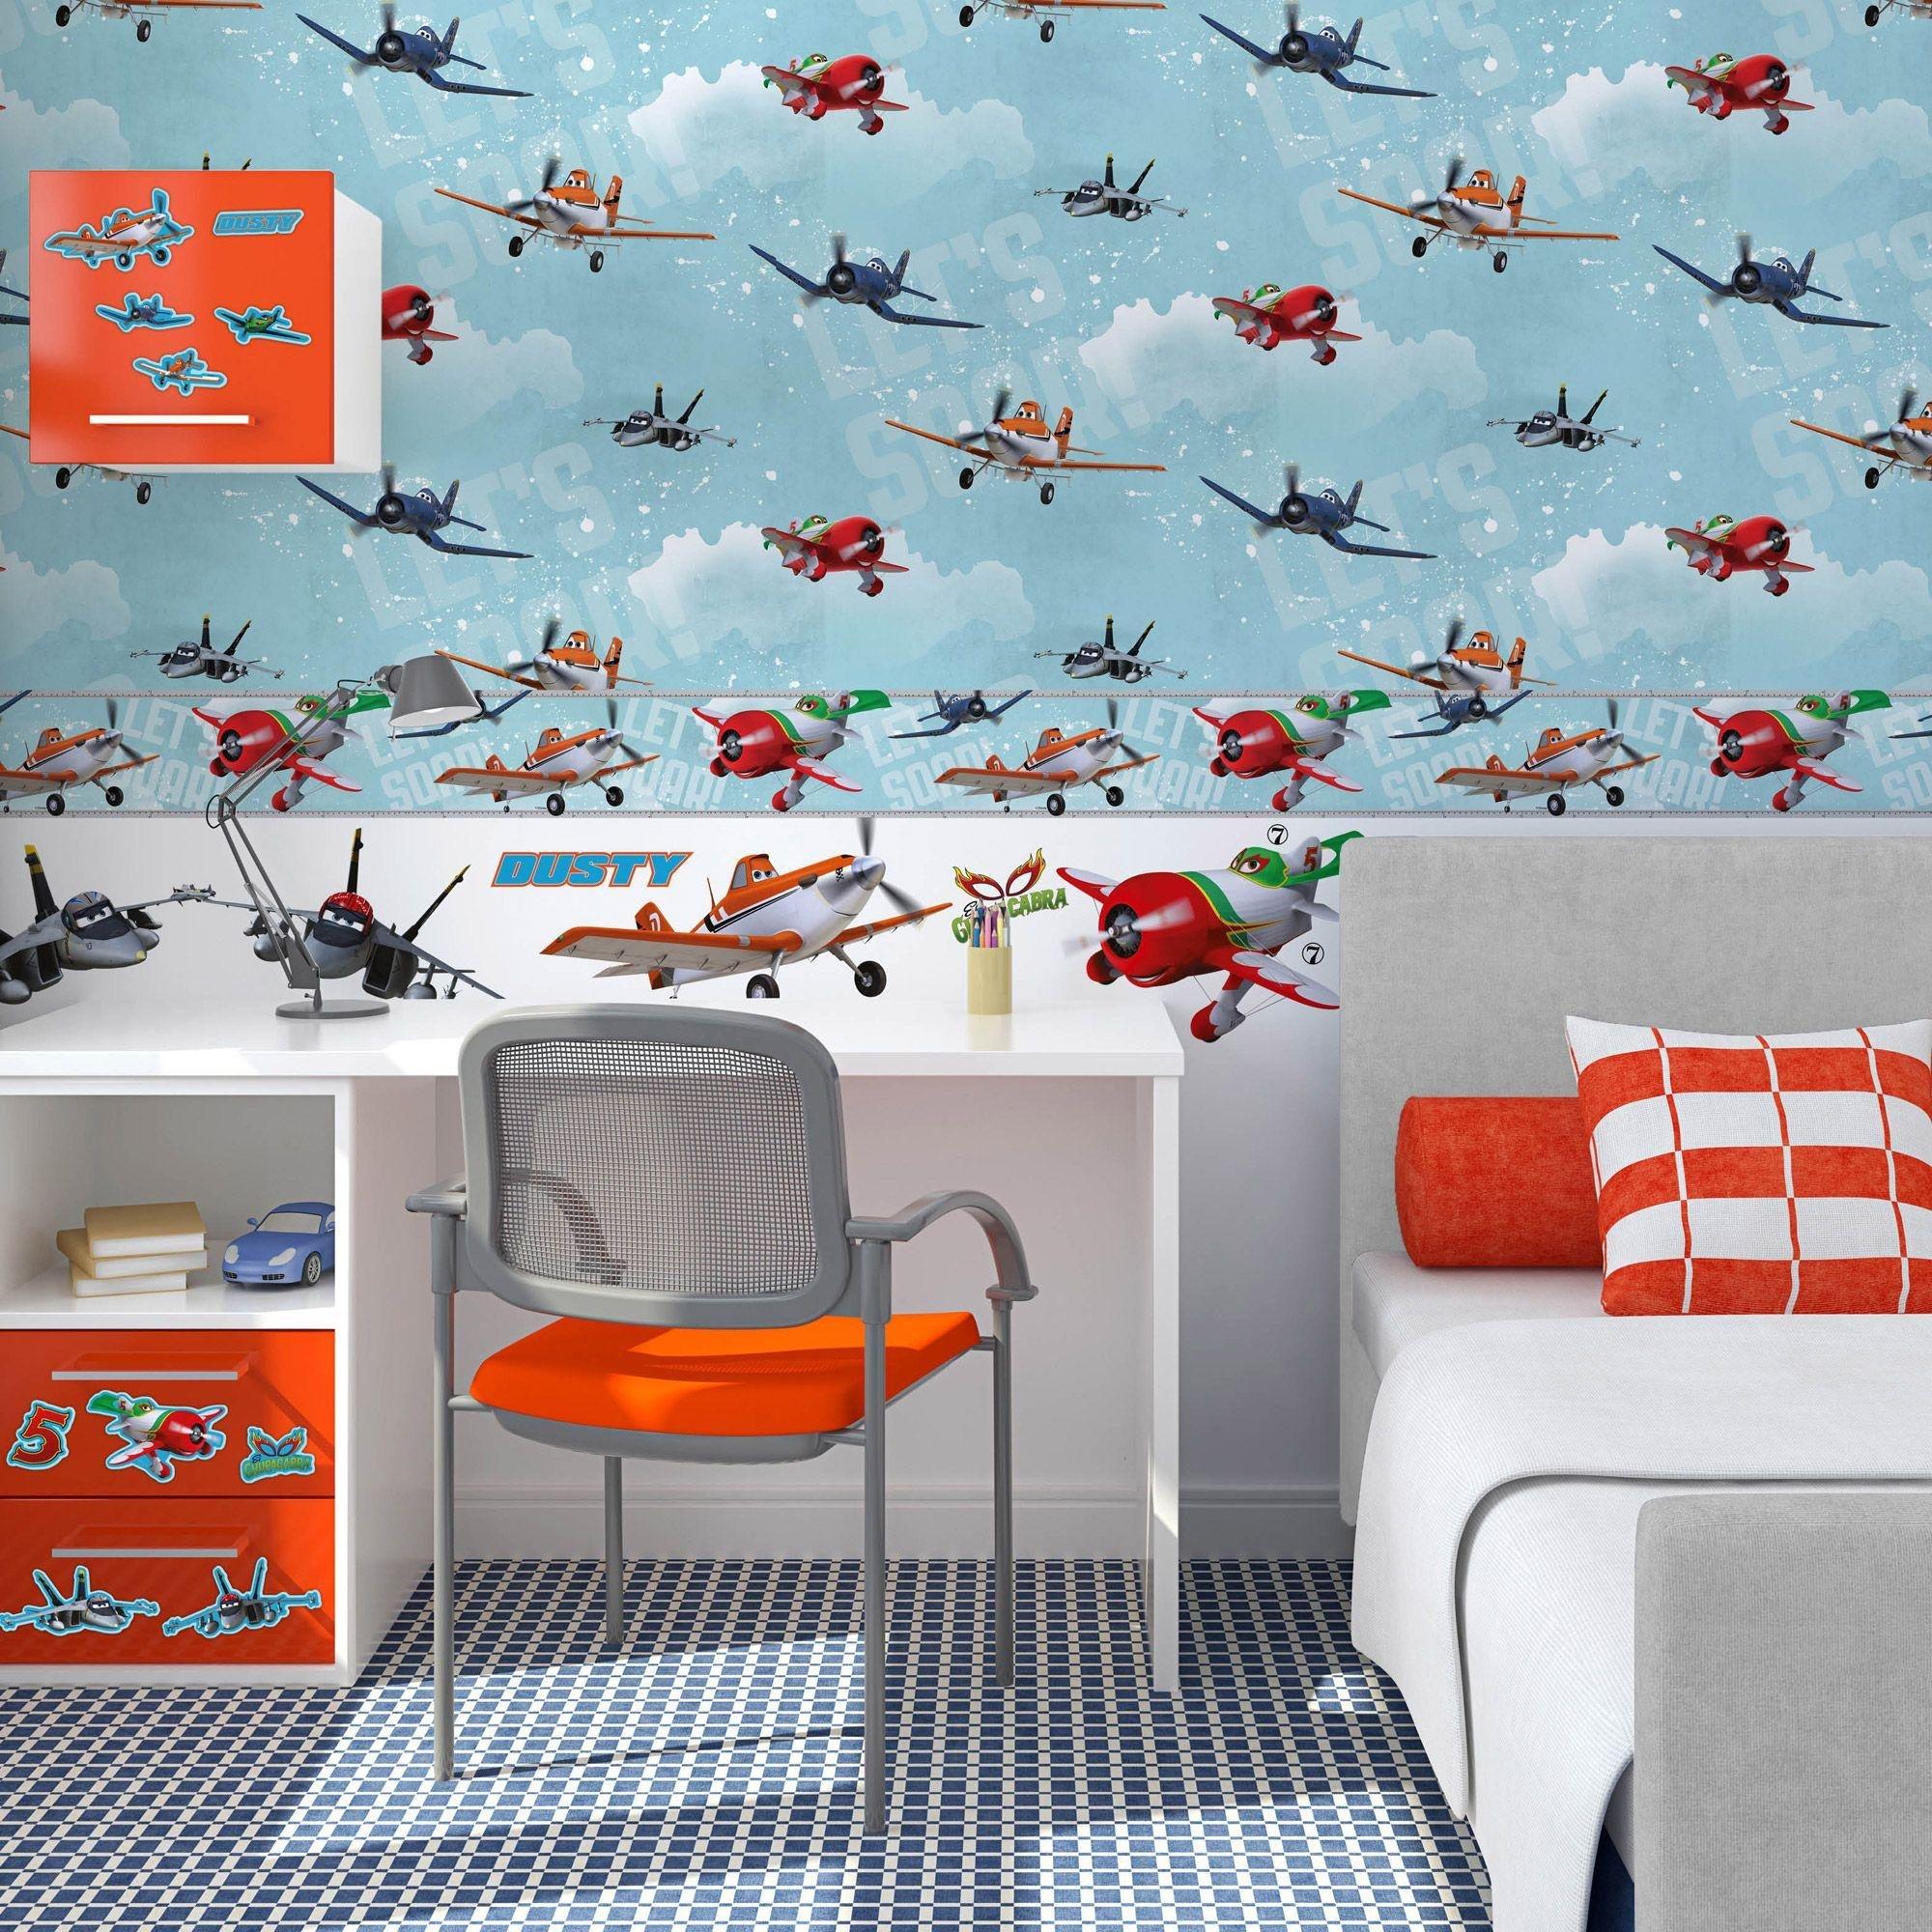 Disney Planes Wallpaper - Multicoloured.